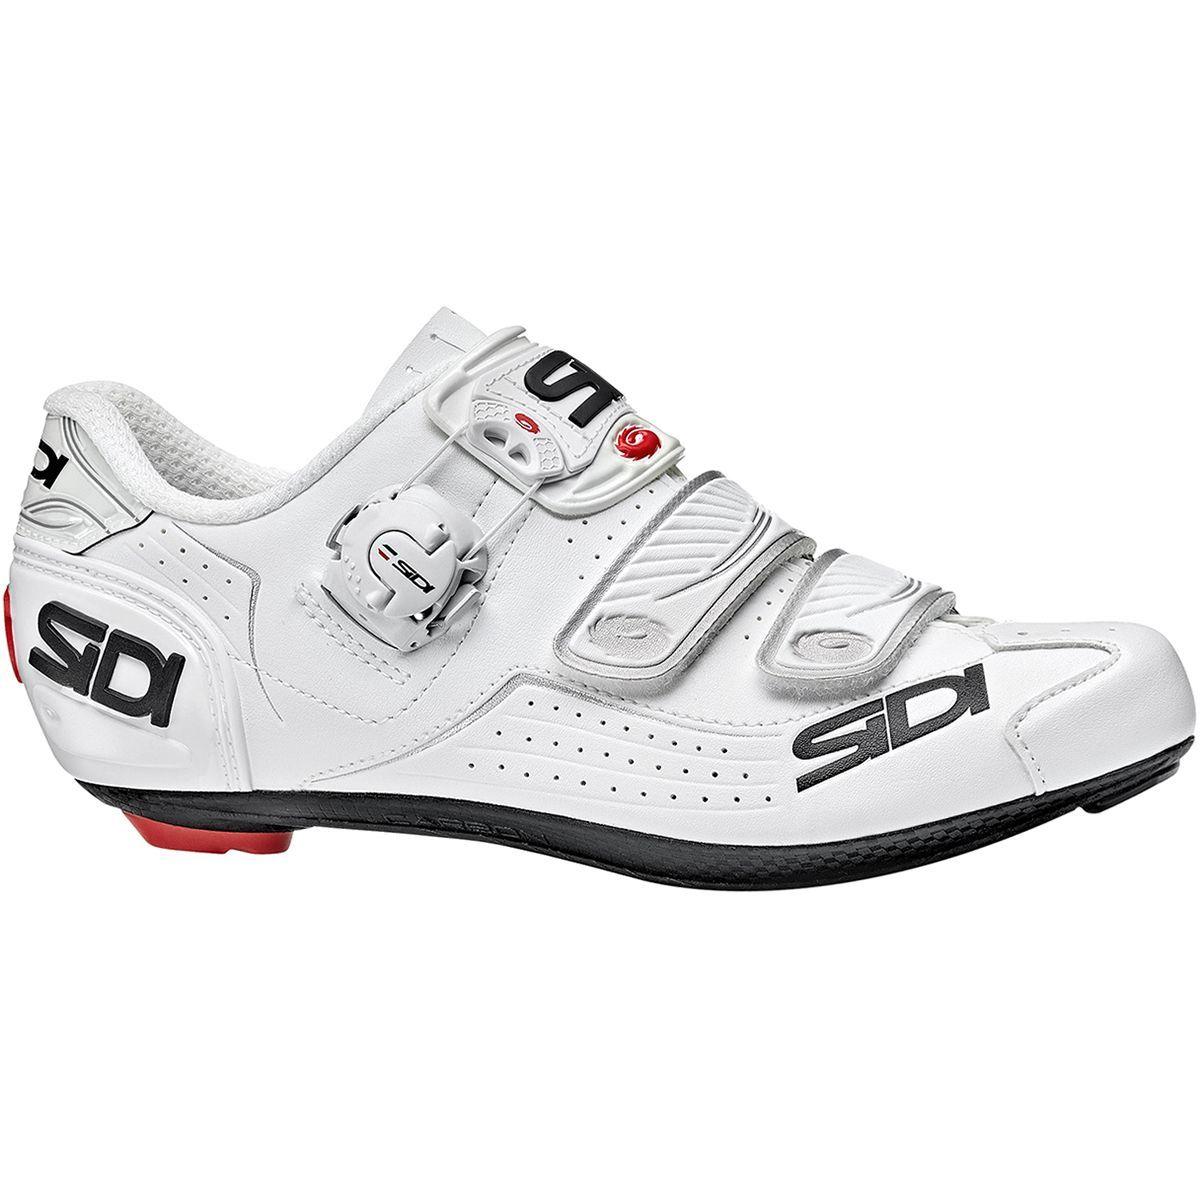 Sidi Alba Carbon Cycling Shoe Women S In 2020 Cycling Shoes Road Cycling Shoes Bike Shoes